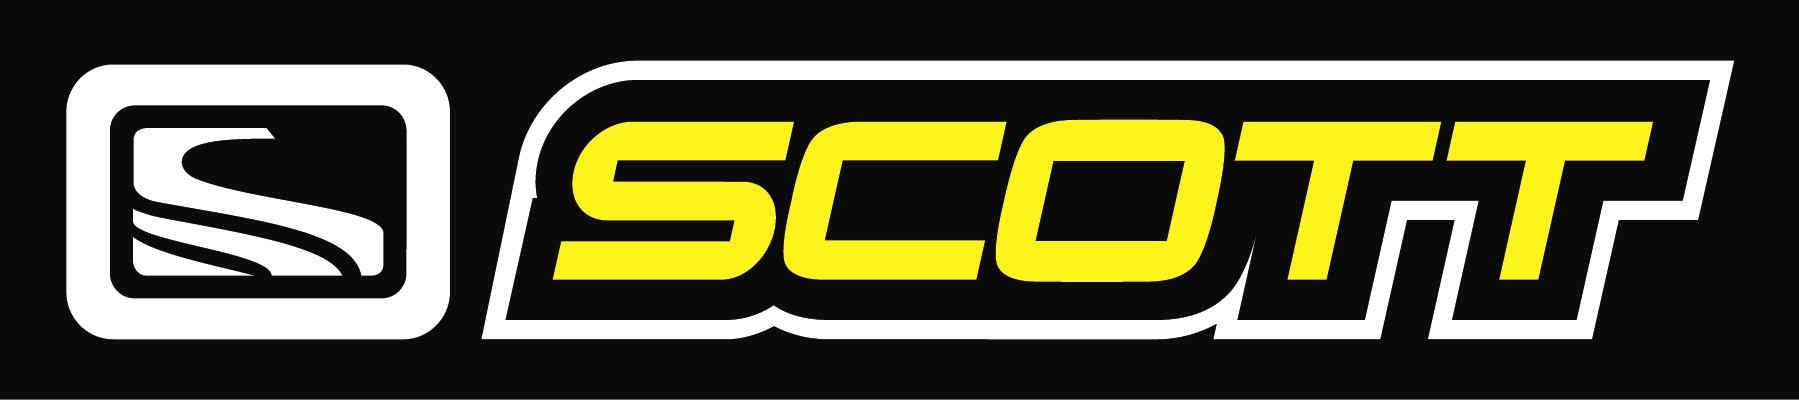 scott-bikes-logojaycee-distributors-ltd-30-years-experience-in-the-motorcycle-trade-agiiashx.jpg